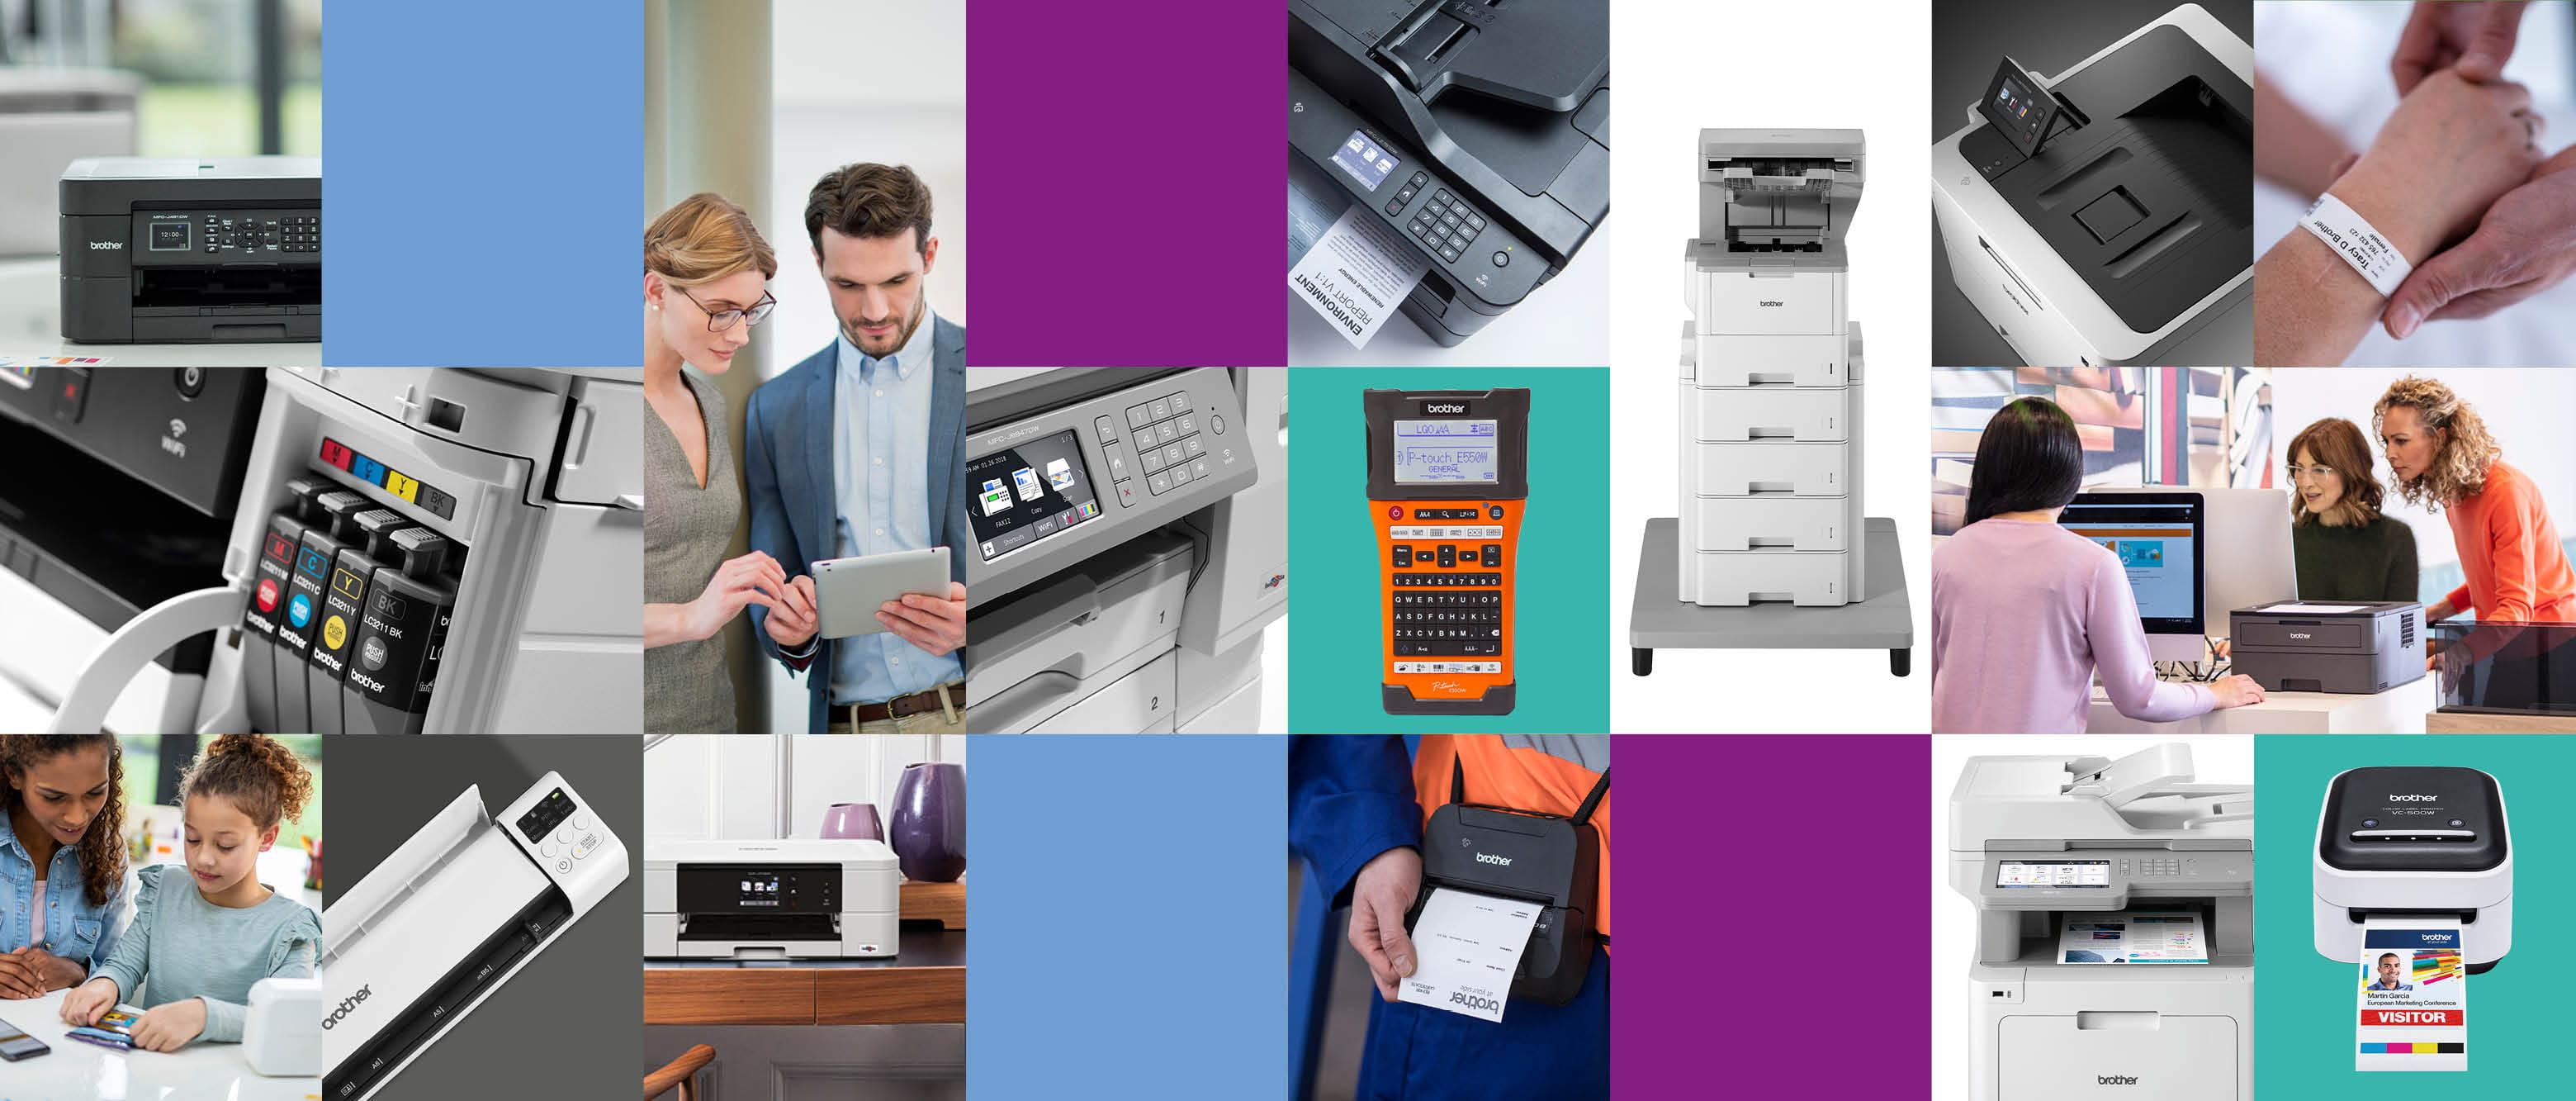 immagini di stampanti, etichettatrici, stampanti portatili e persone